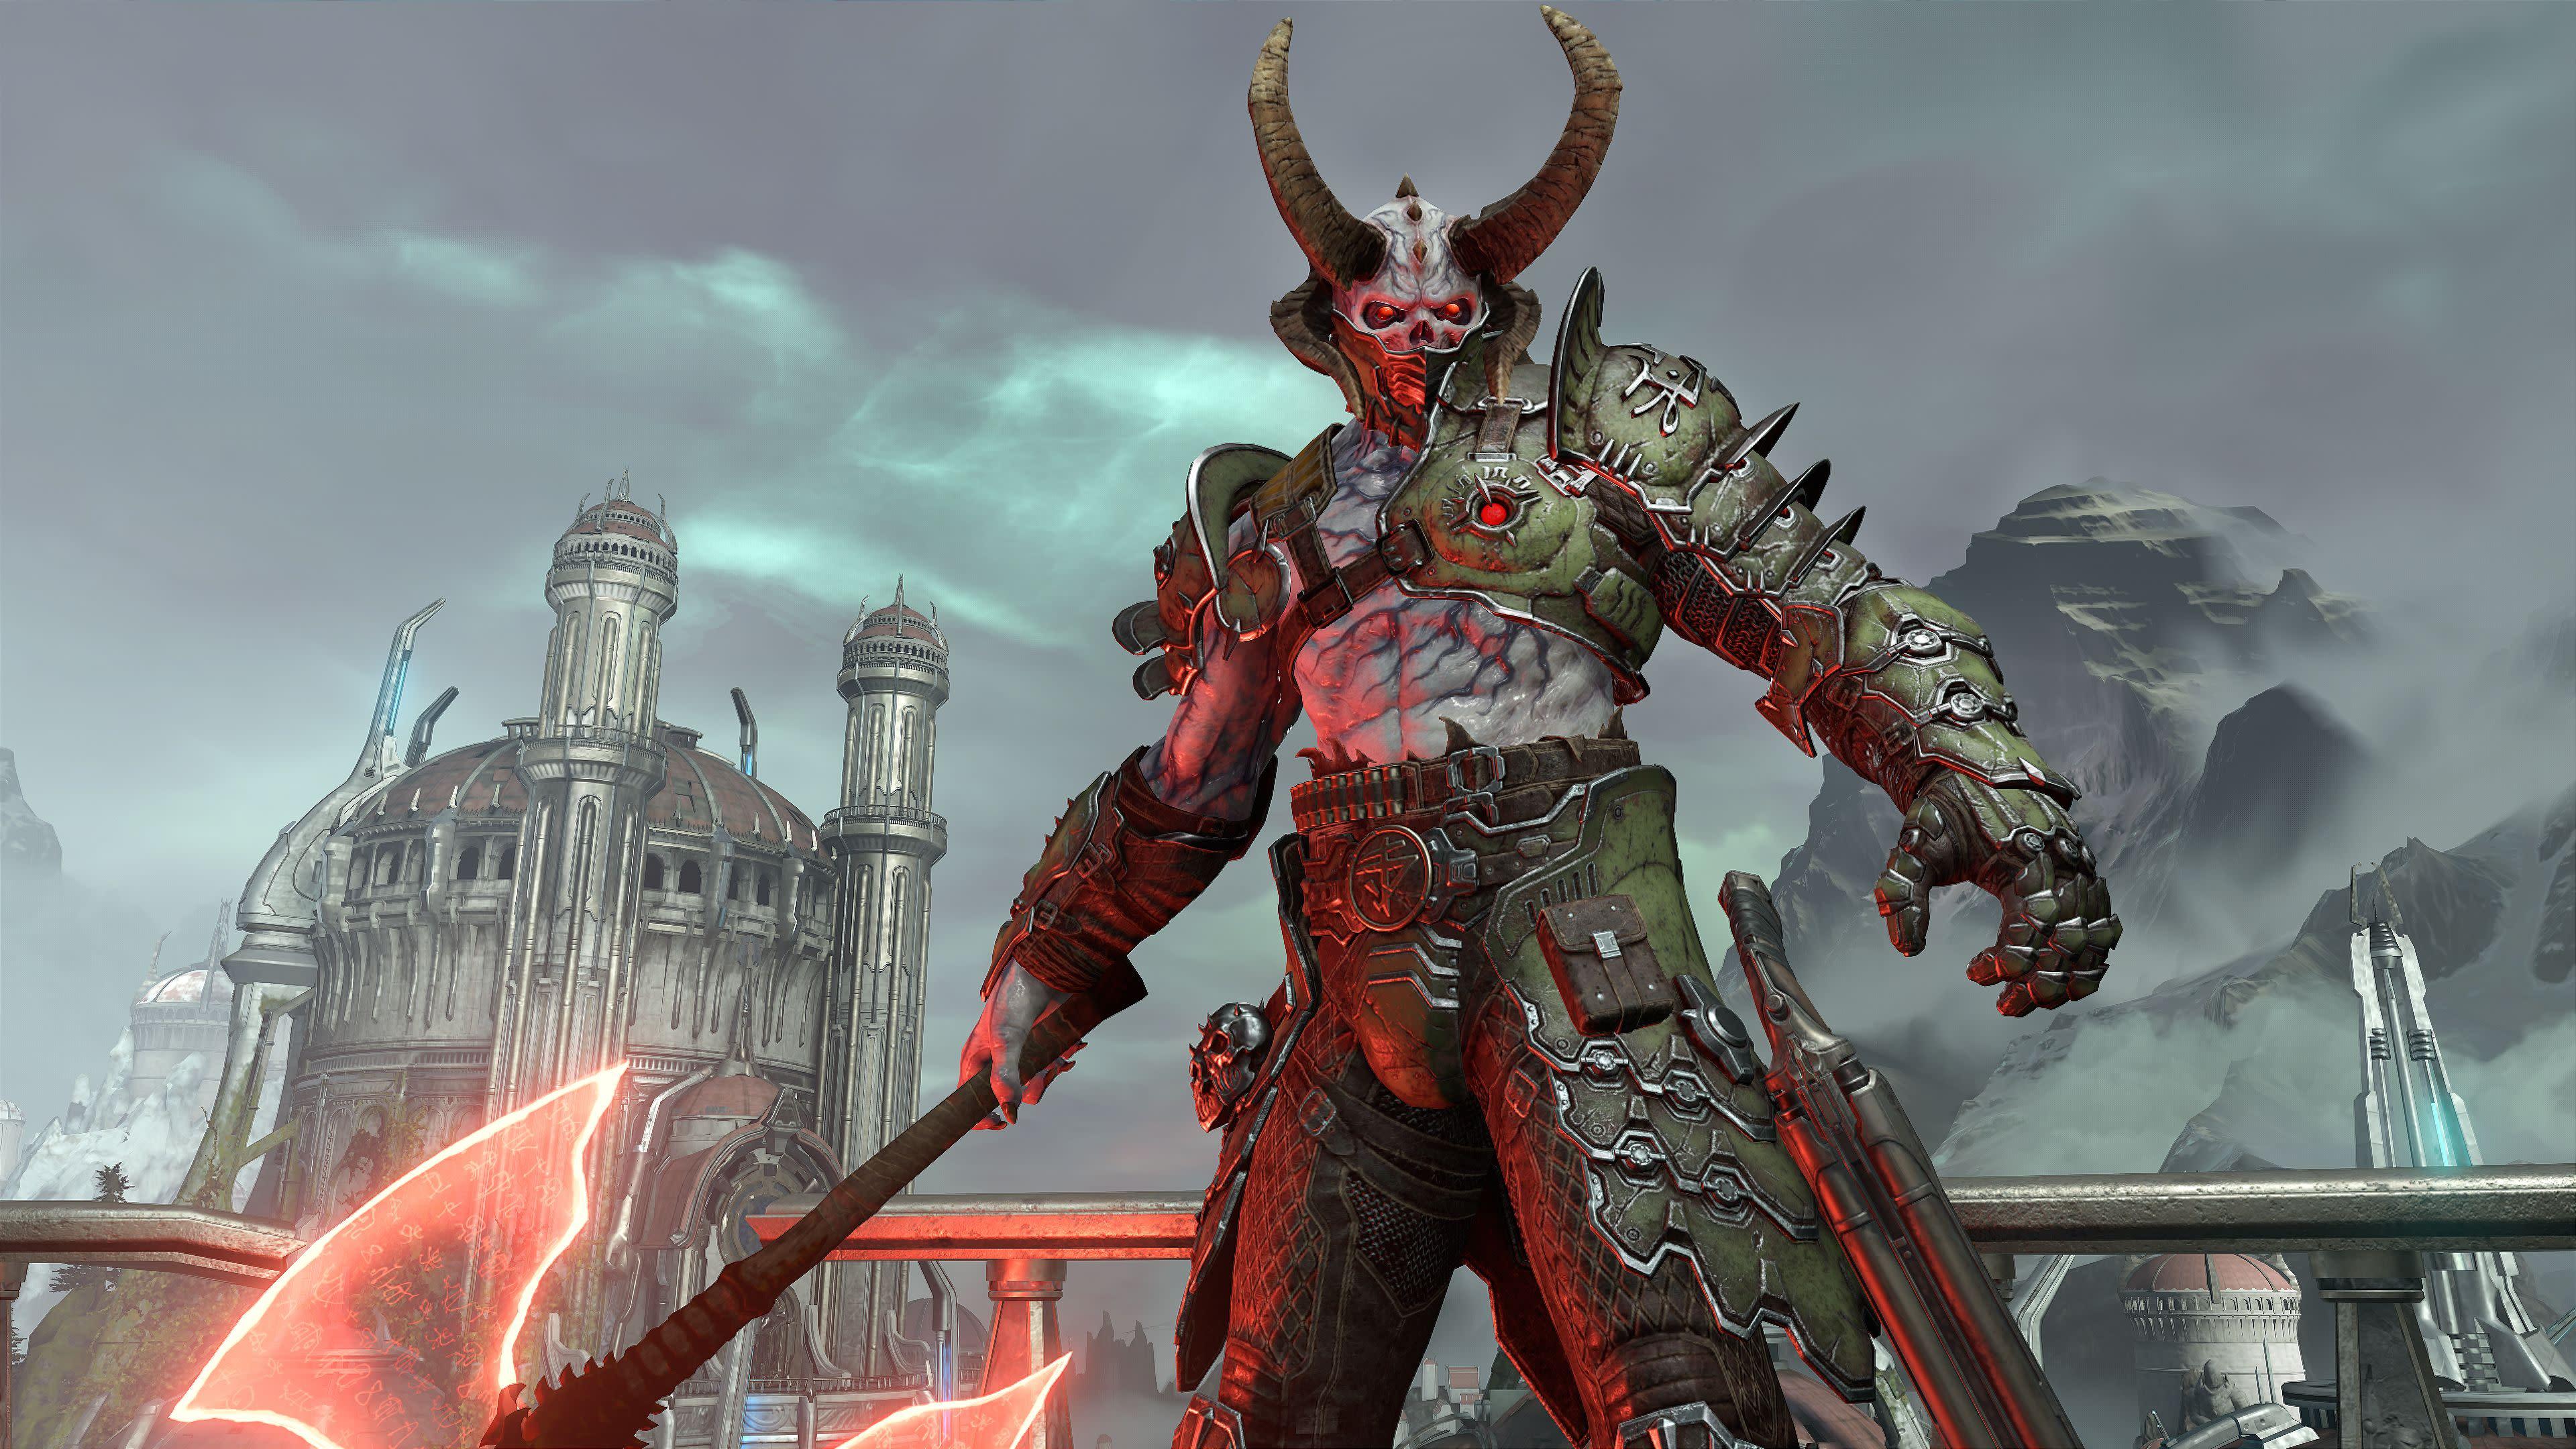 E3 2019: Bethesda embraces action in 'Doom Eternal